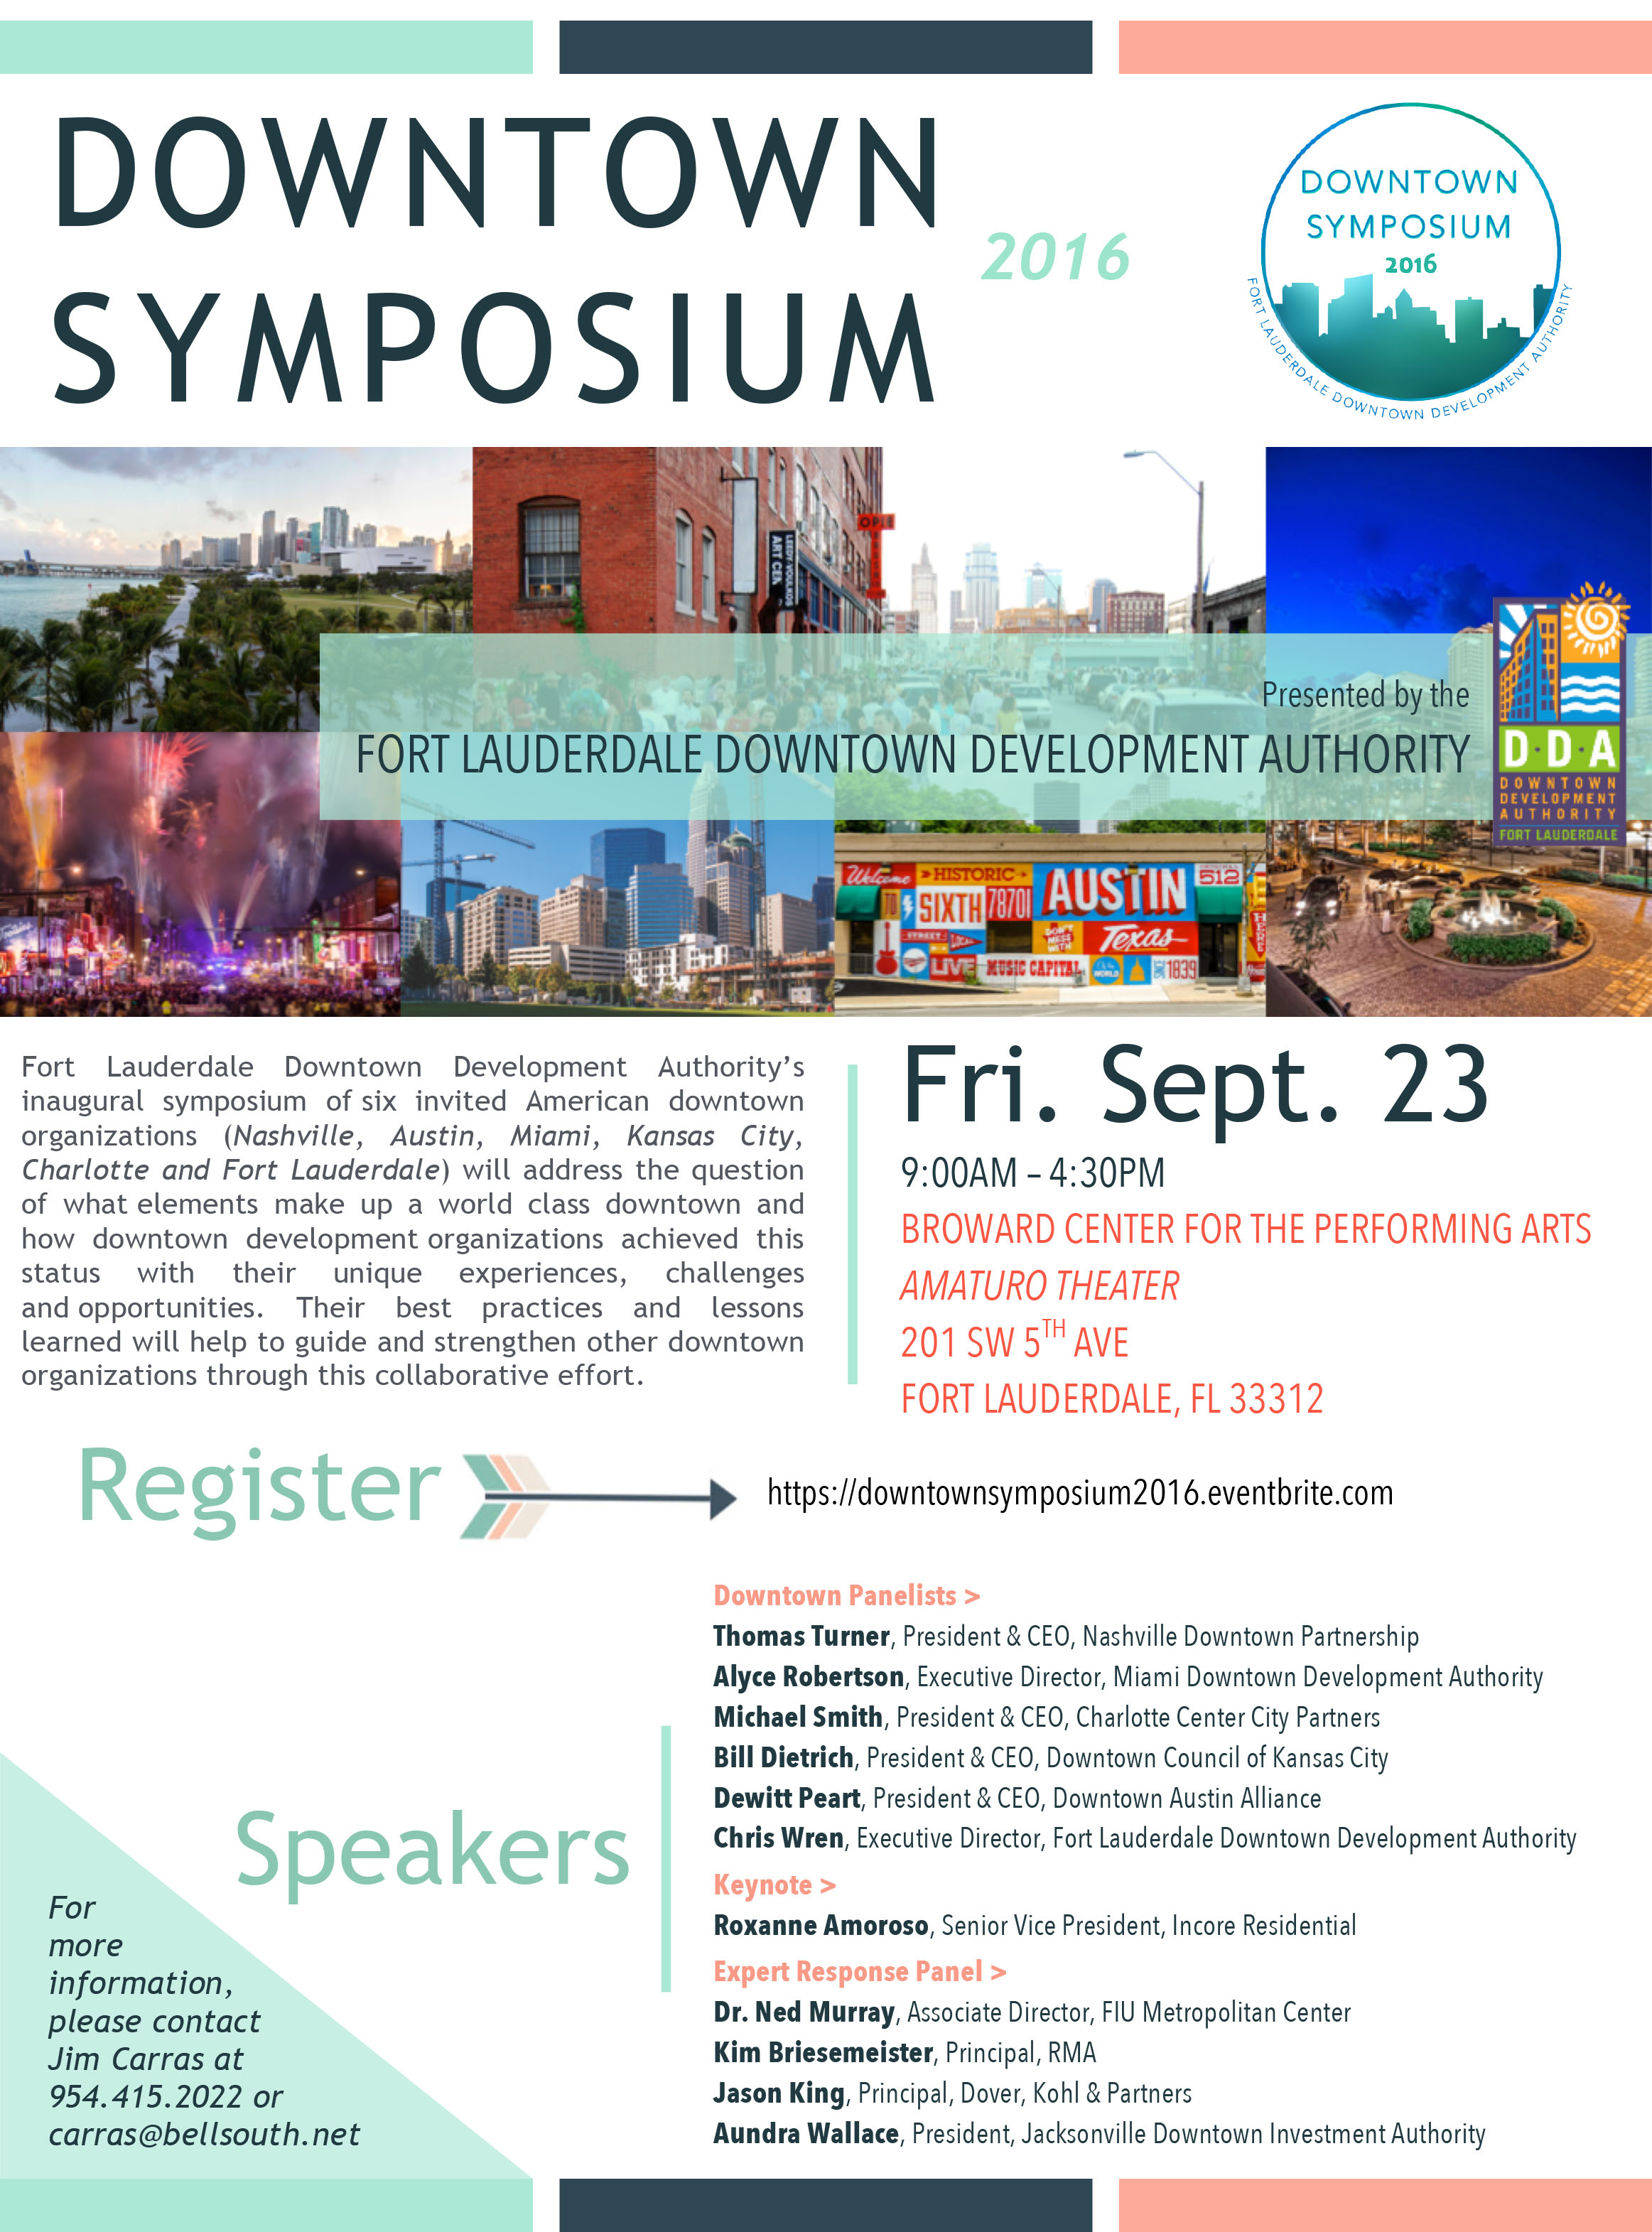 Microsoft Word - Symposium Info Flyer.docx